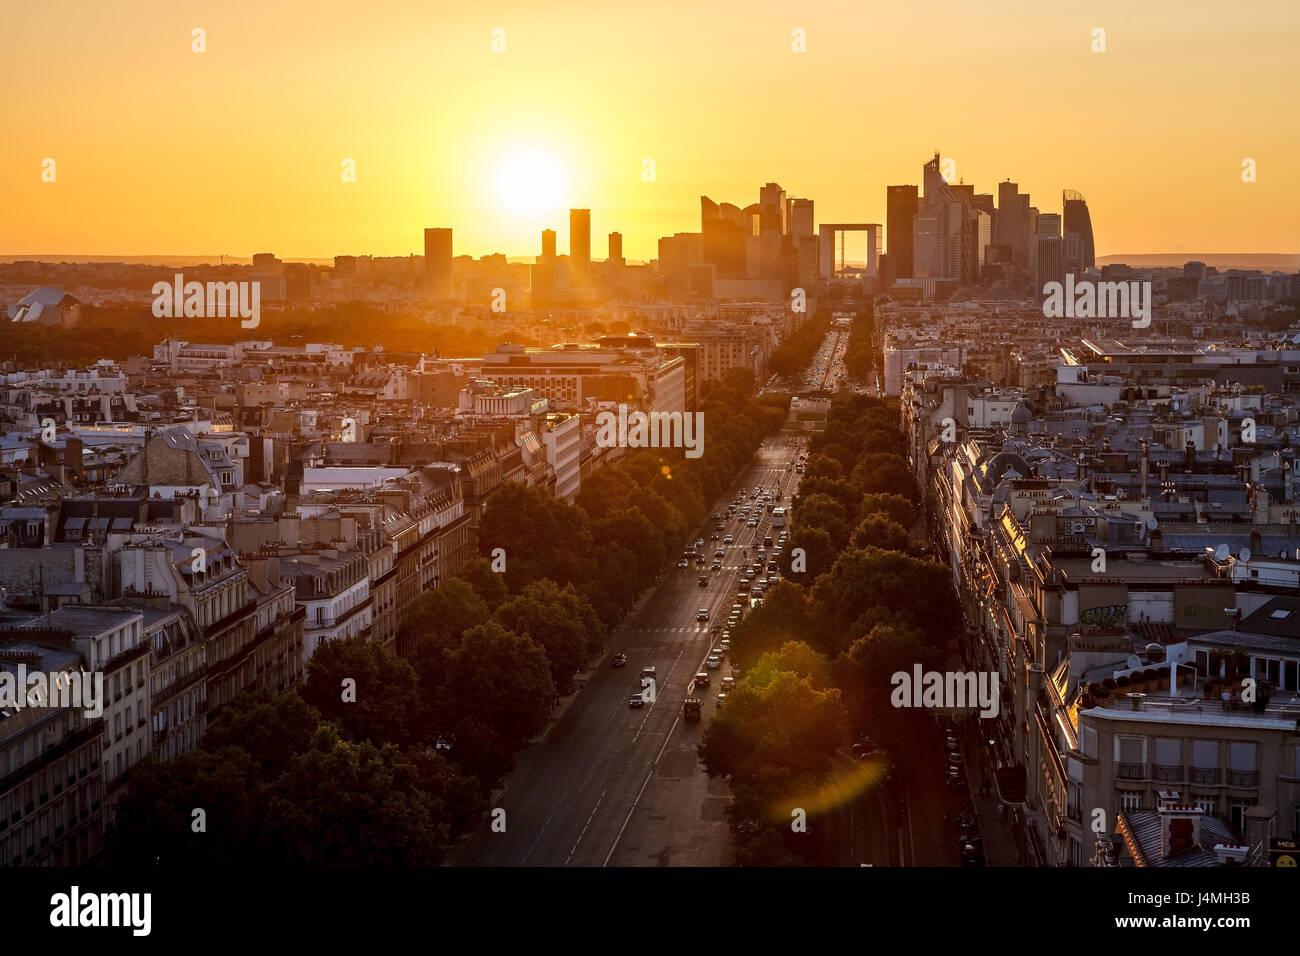 Avenue De La Grande Armee und La Défense Viertel in Paris bei Sonnenuntergang. Frankreich Stockbild